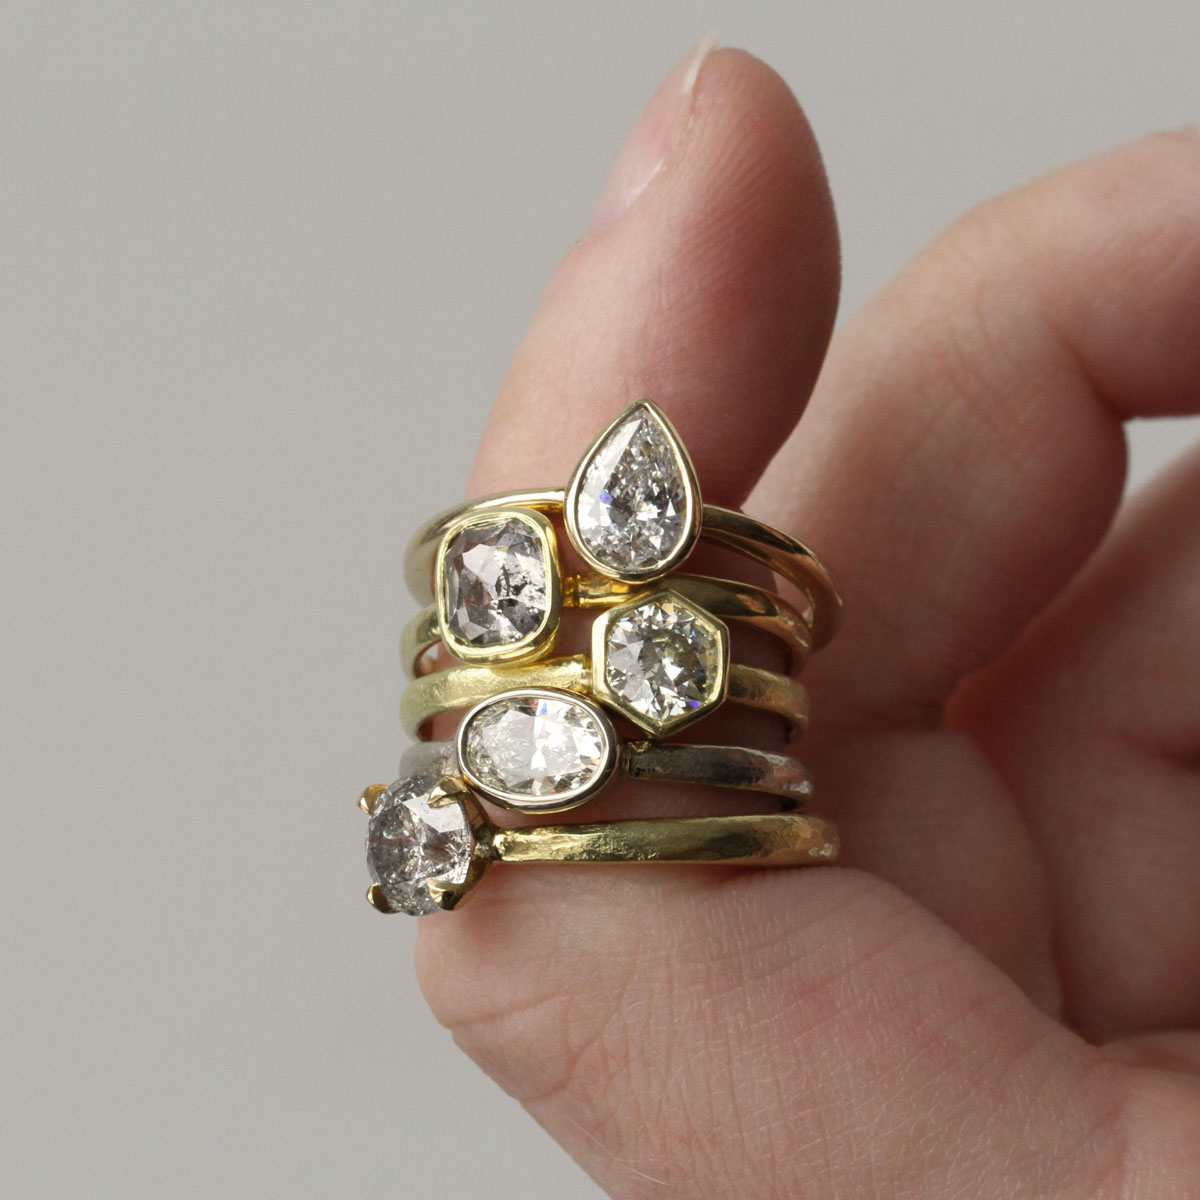 Sophie Hughes Unique Engagement Rings - Sophie Hughes.jpg